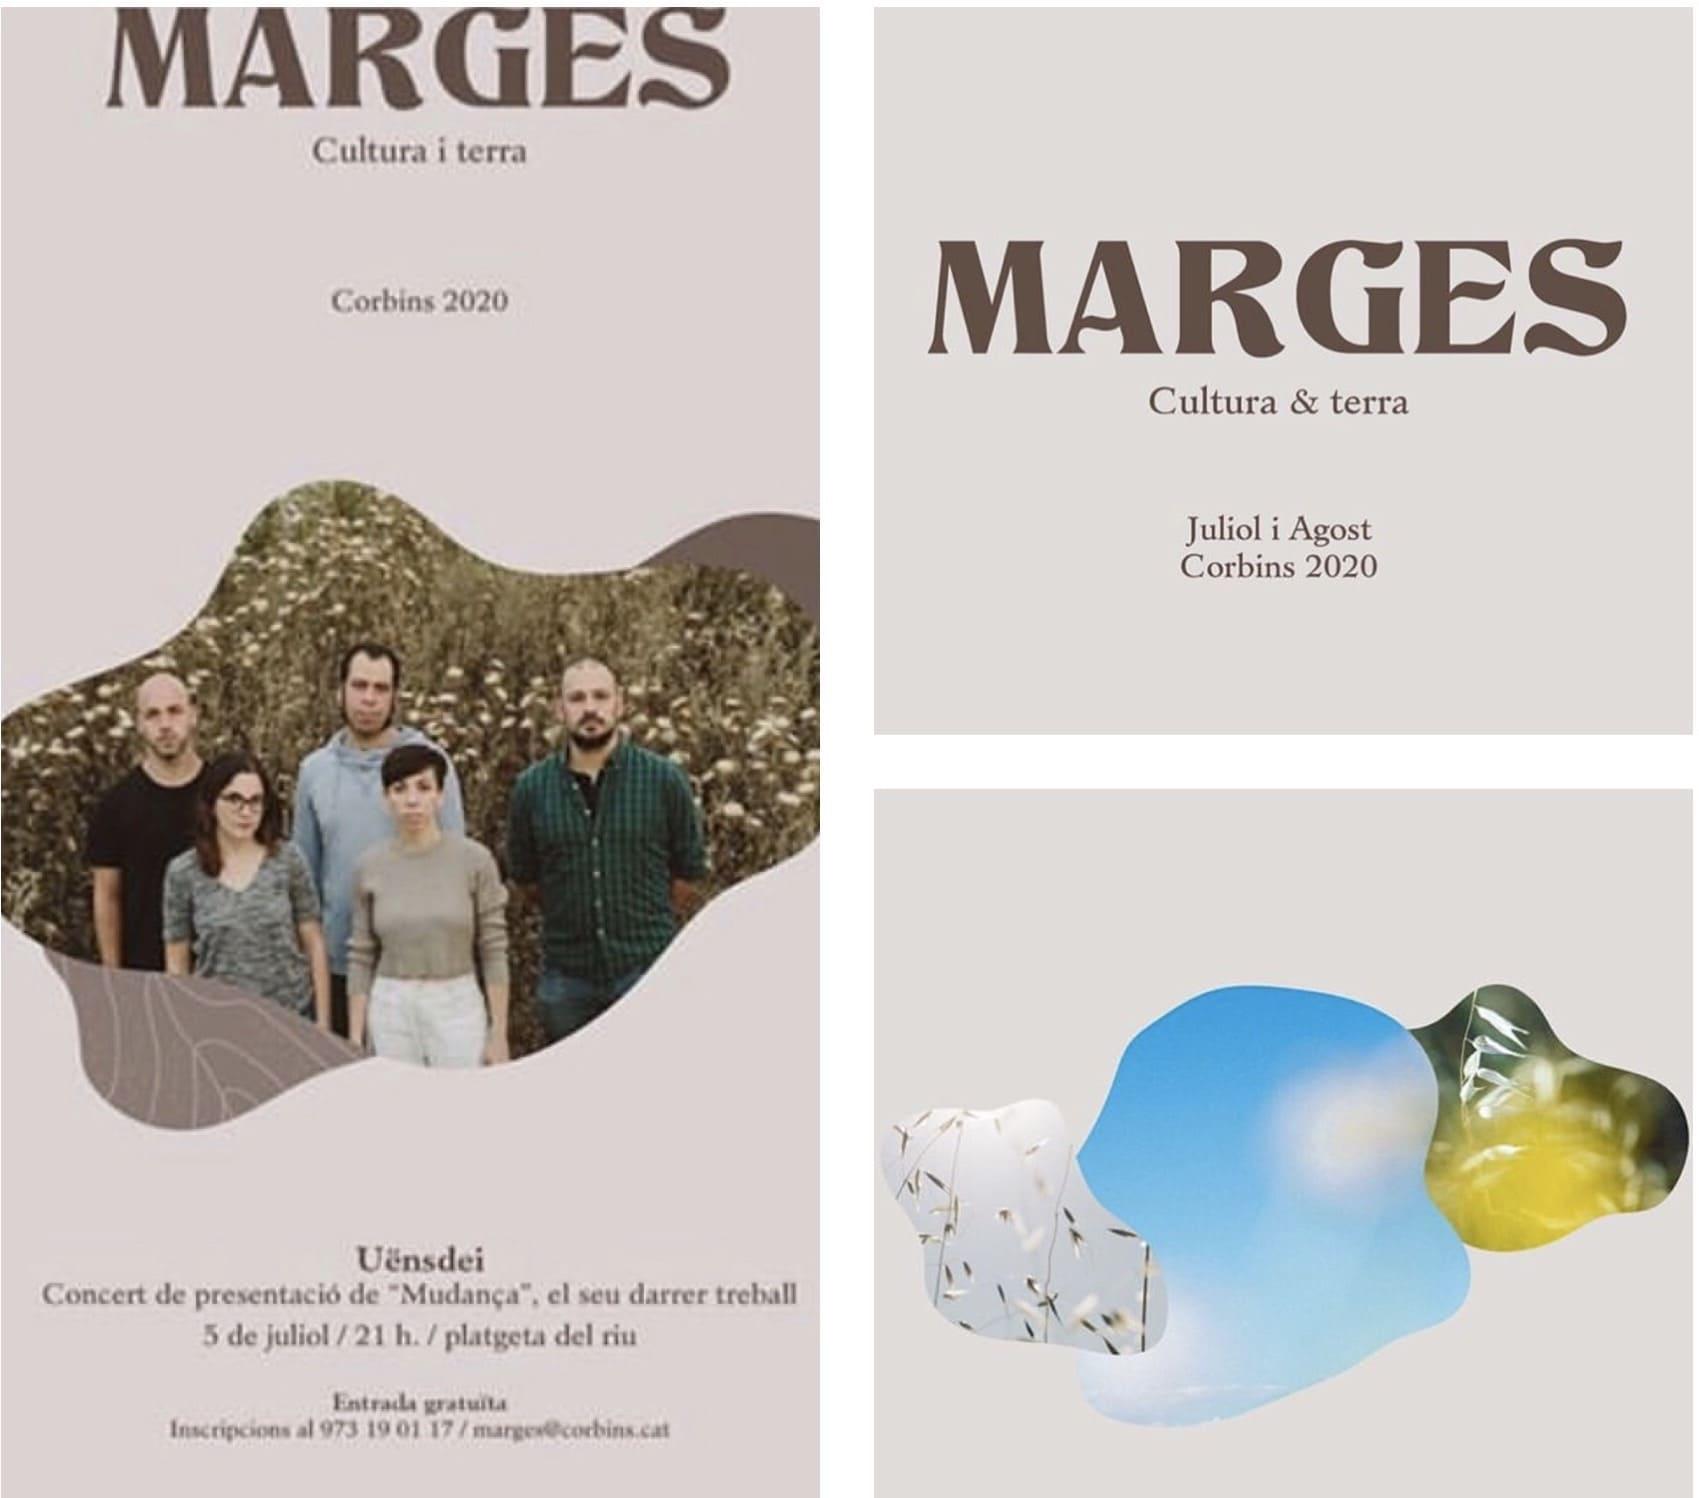 Cartells i logo Festival Marges dissenyats per Latipo